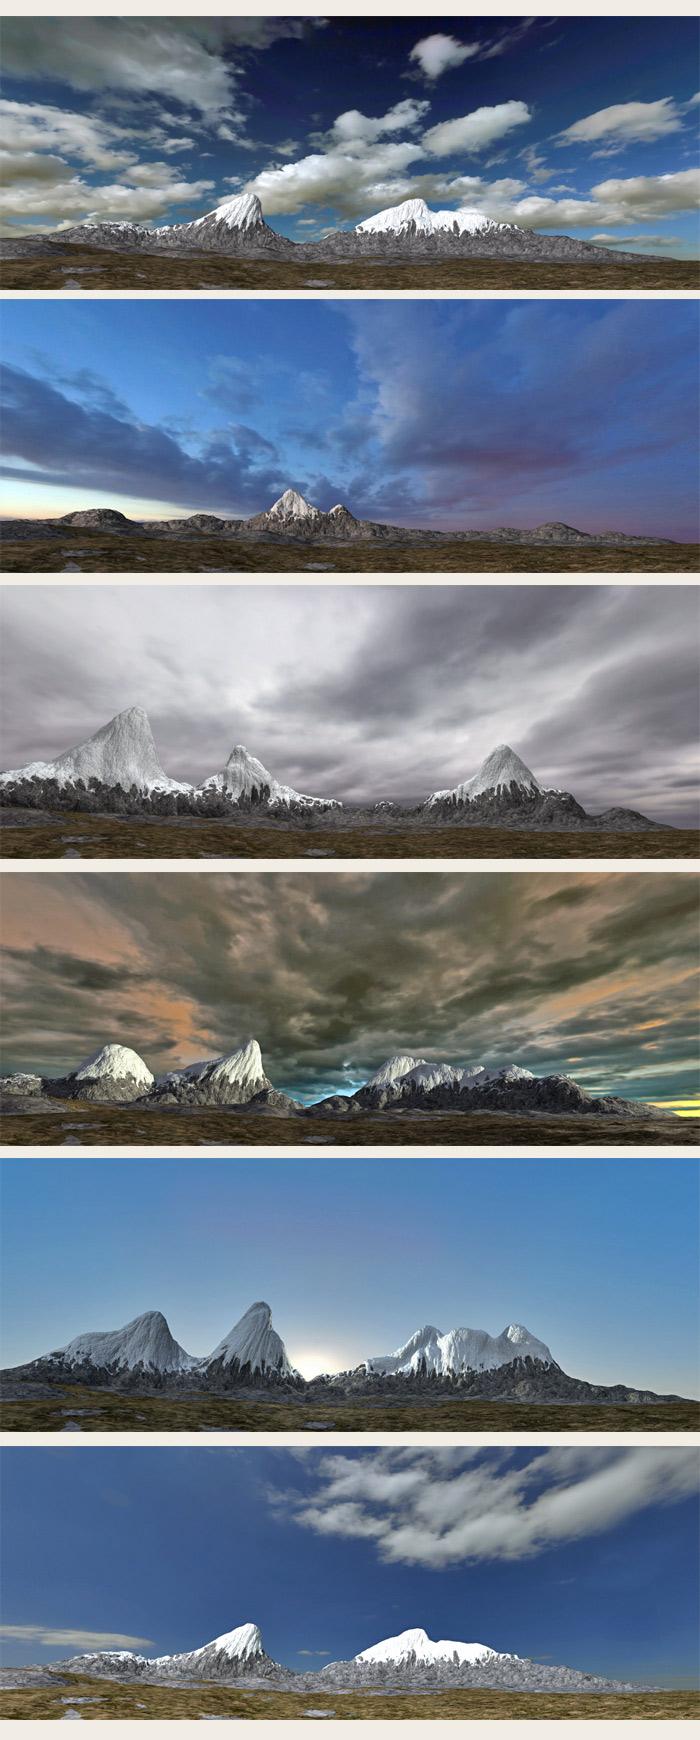 TerraDome Expansion 1 - Ancient Worlds: Celtic Mists by: Colm JacksonRuntimeDNASyydTraveler, 3D Models by Daz 3D